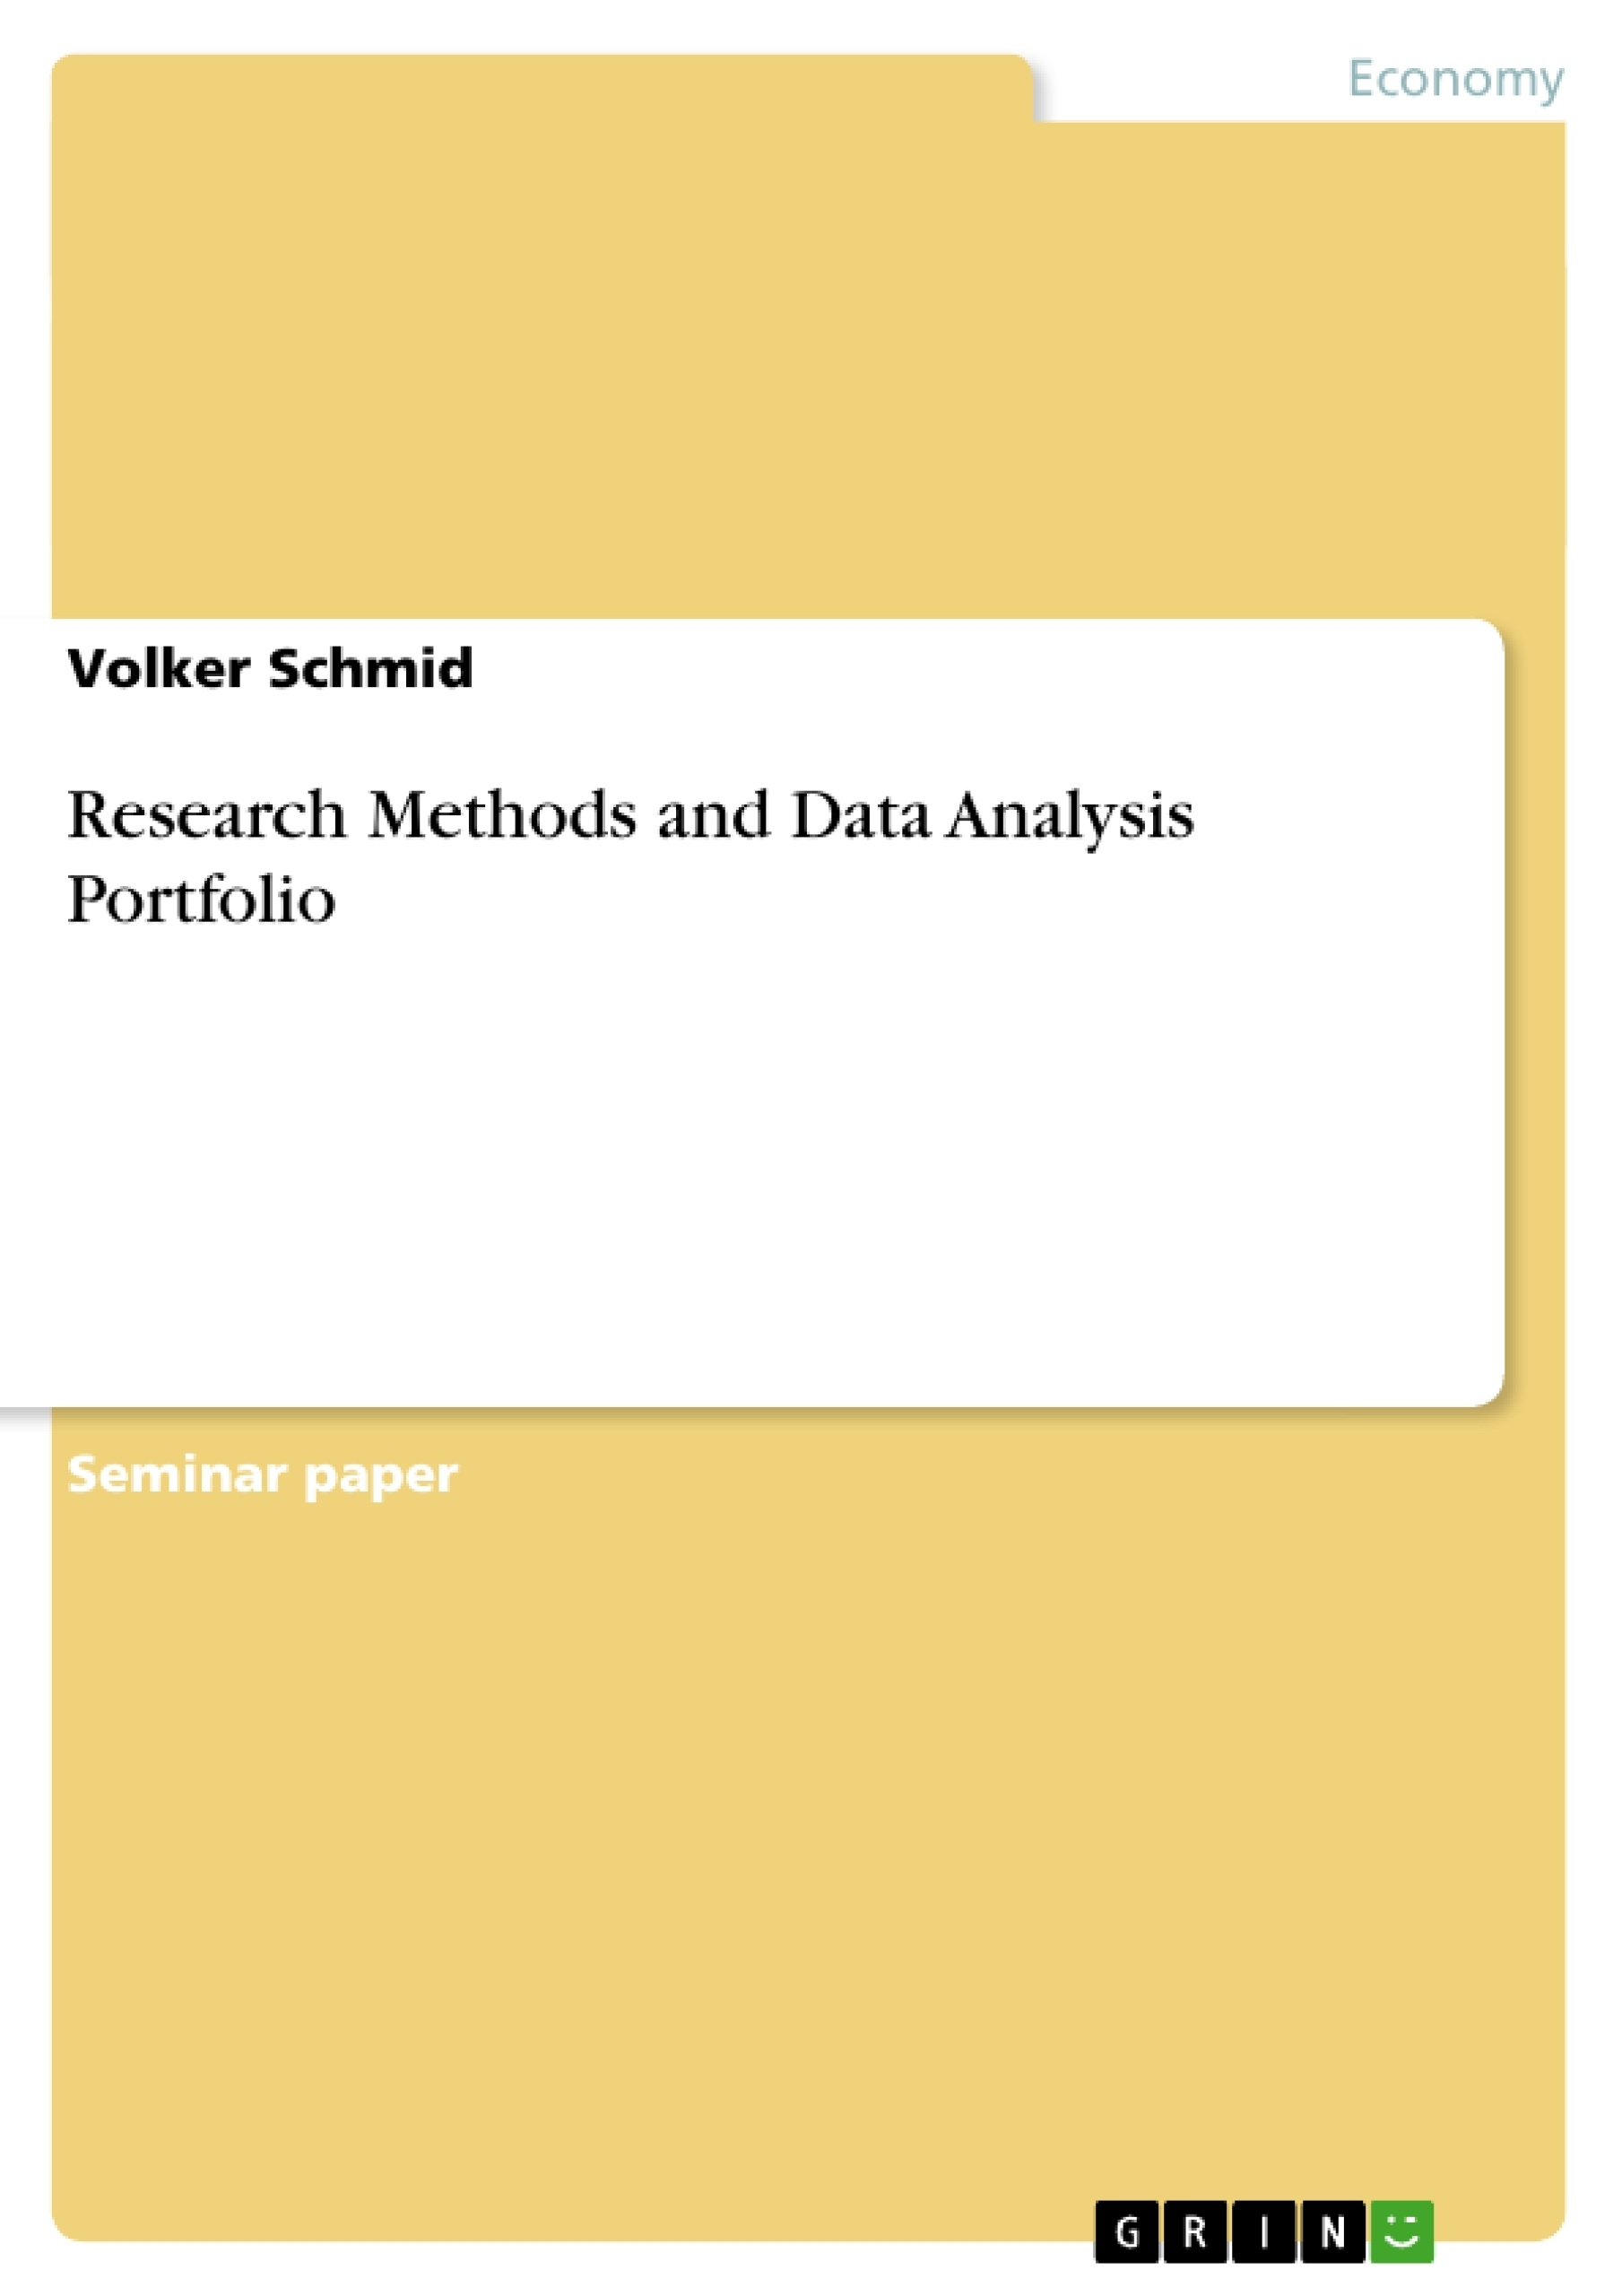 Title: Research Methods and Data Analysis Portfolio